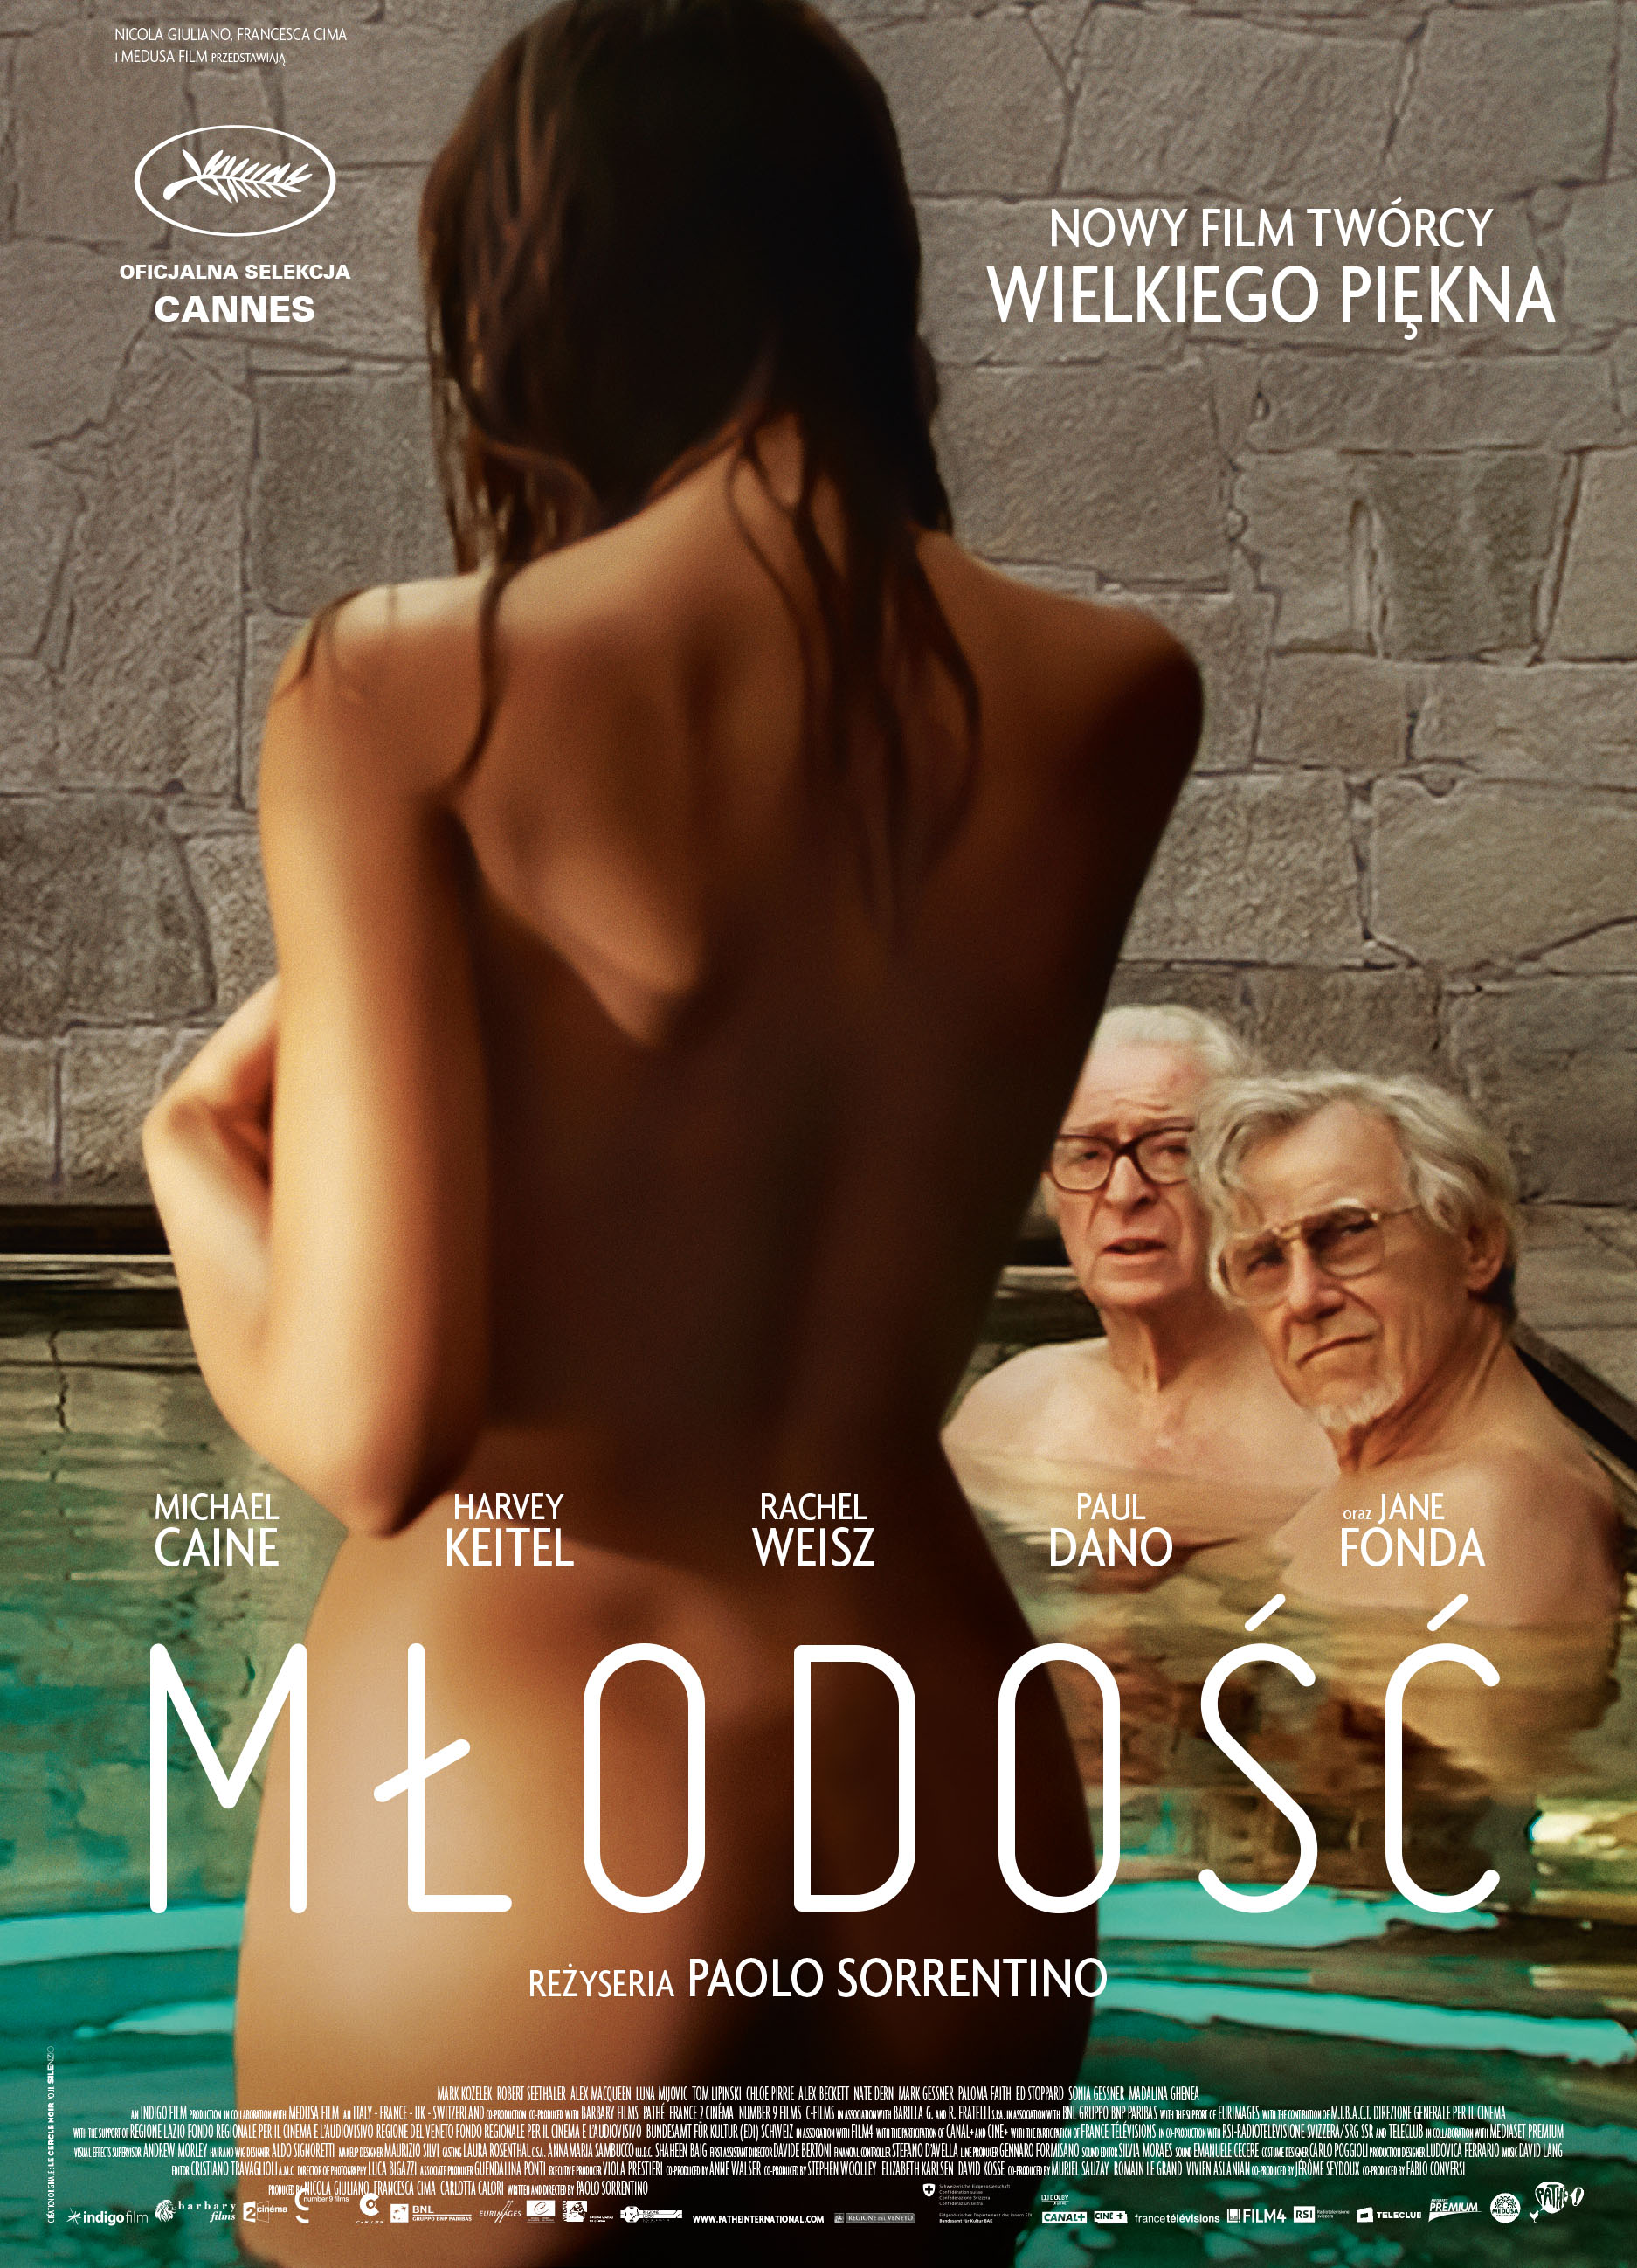 Mlodosc_B1_plakat_1457010154.jpg (./../foto/tekst)